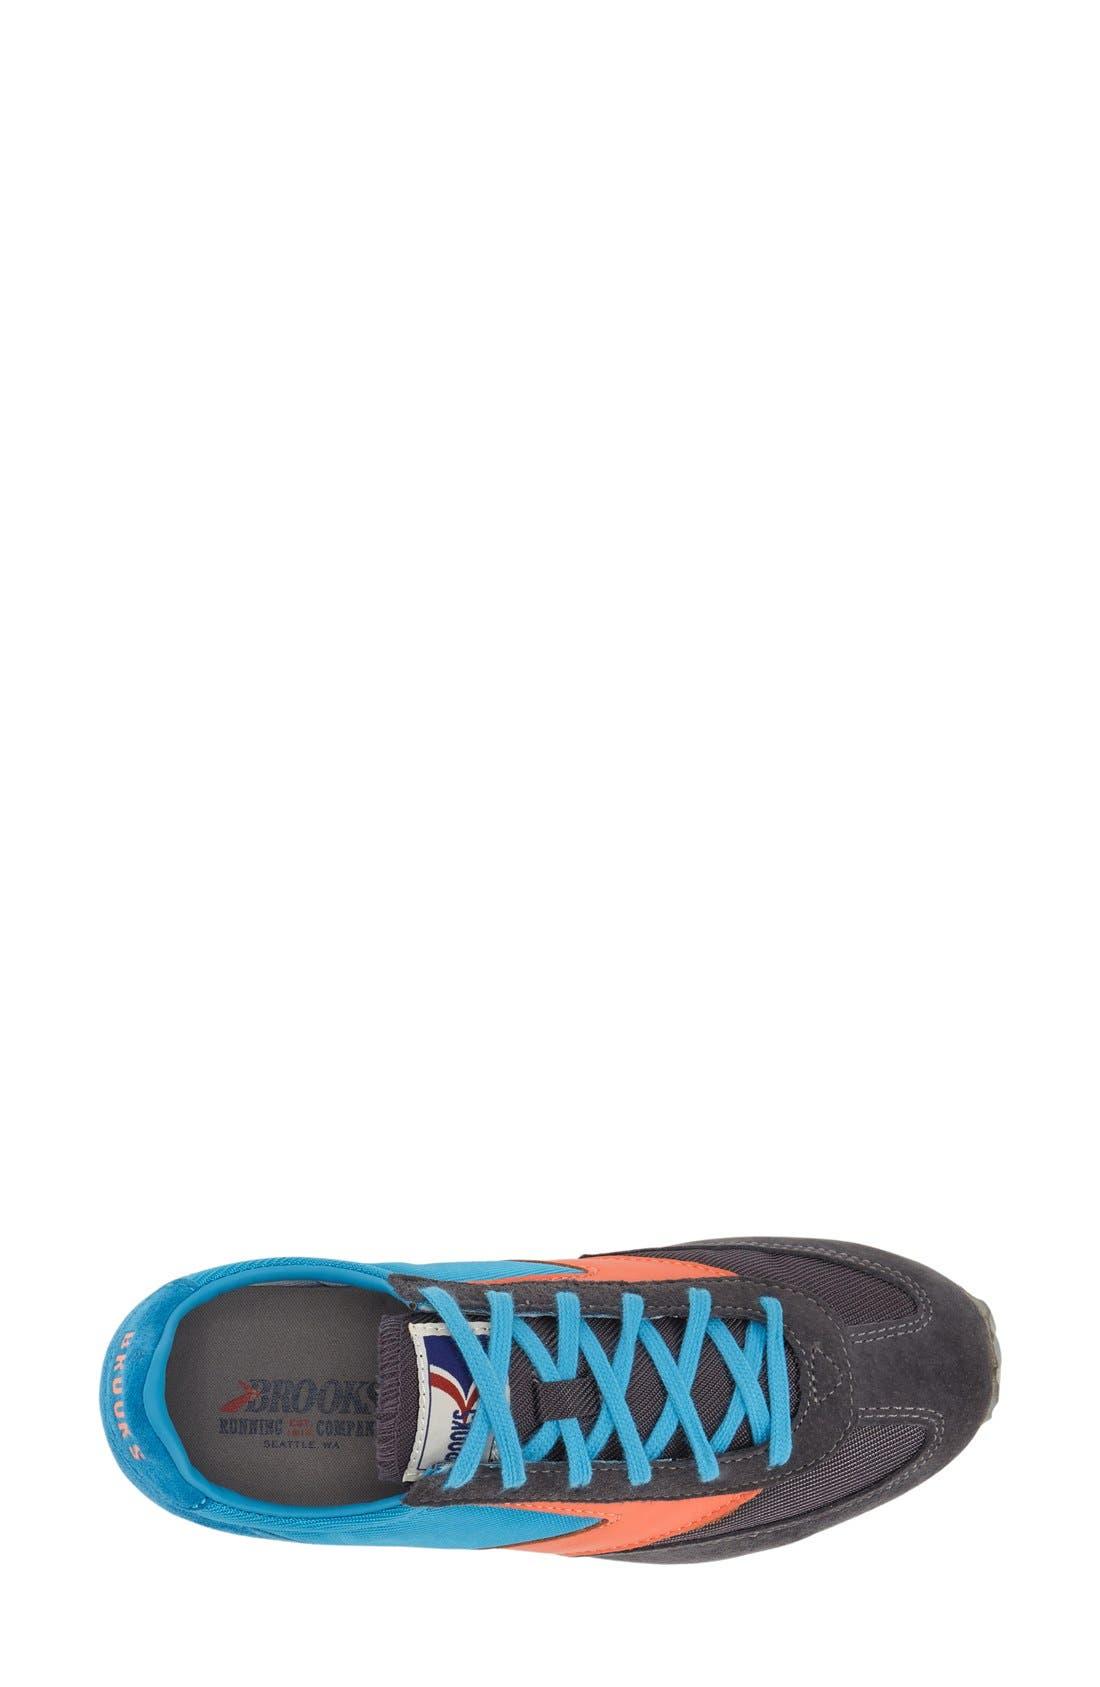 'Vanguard' Sneaker,                             Alternate thumbnail 83, color,